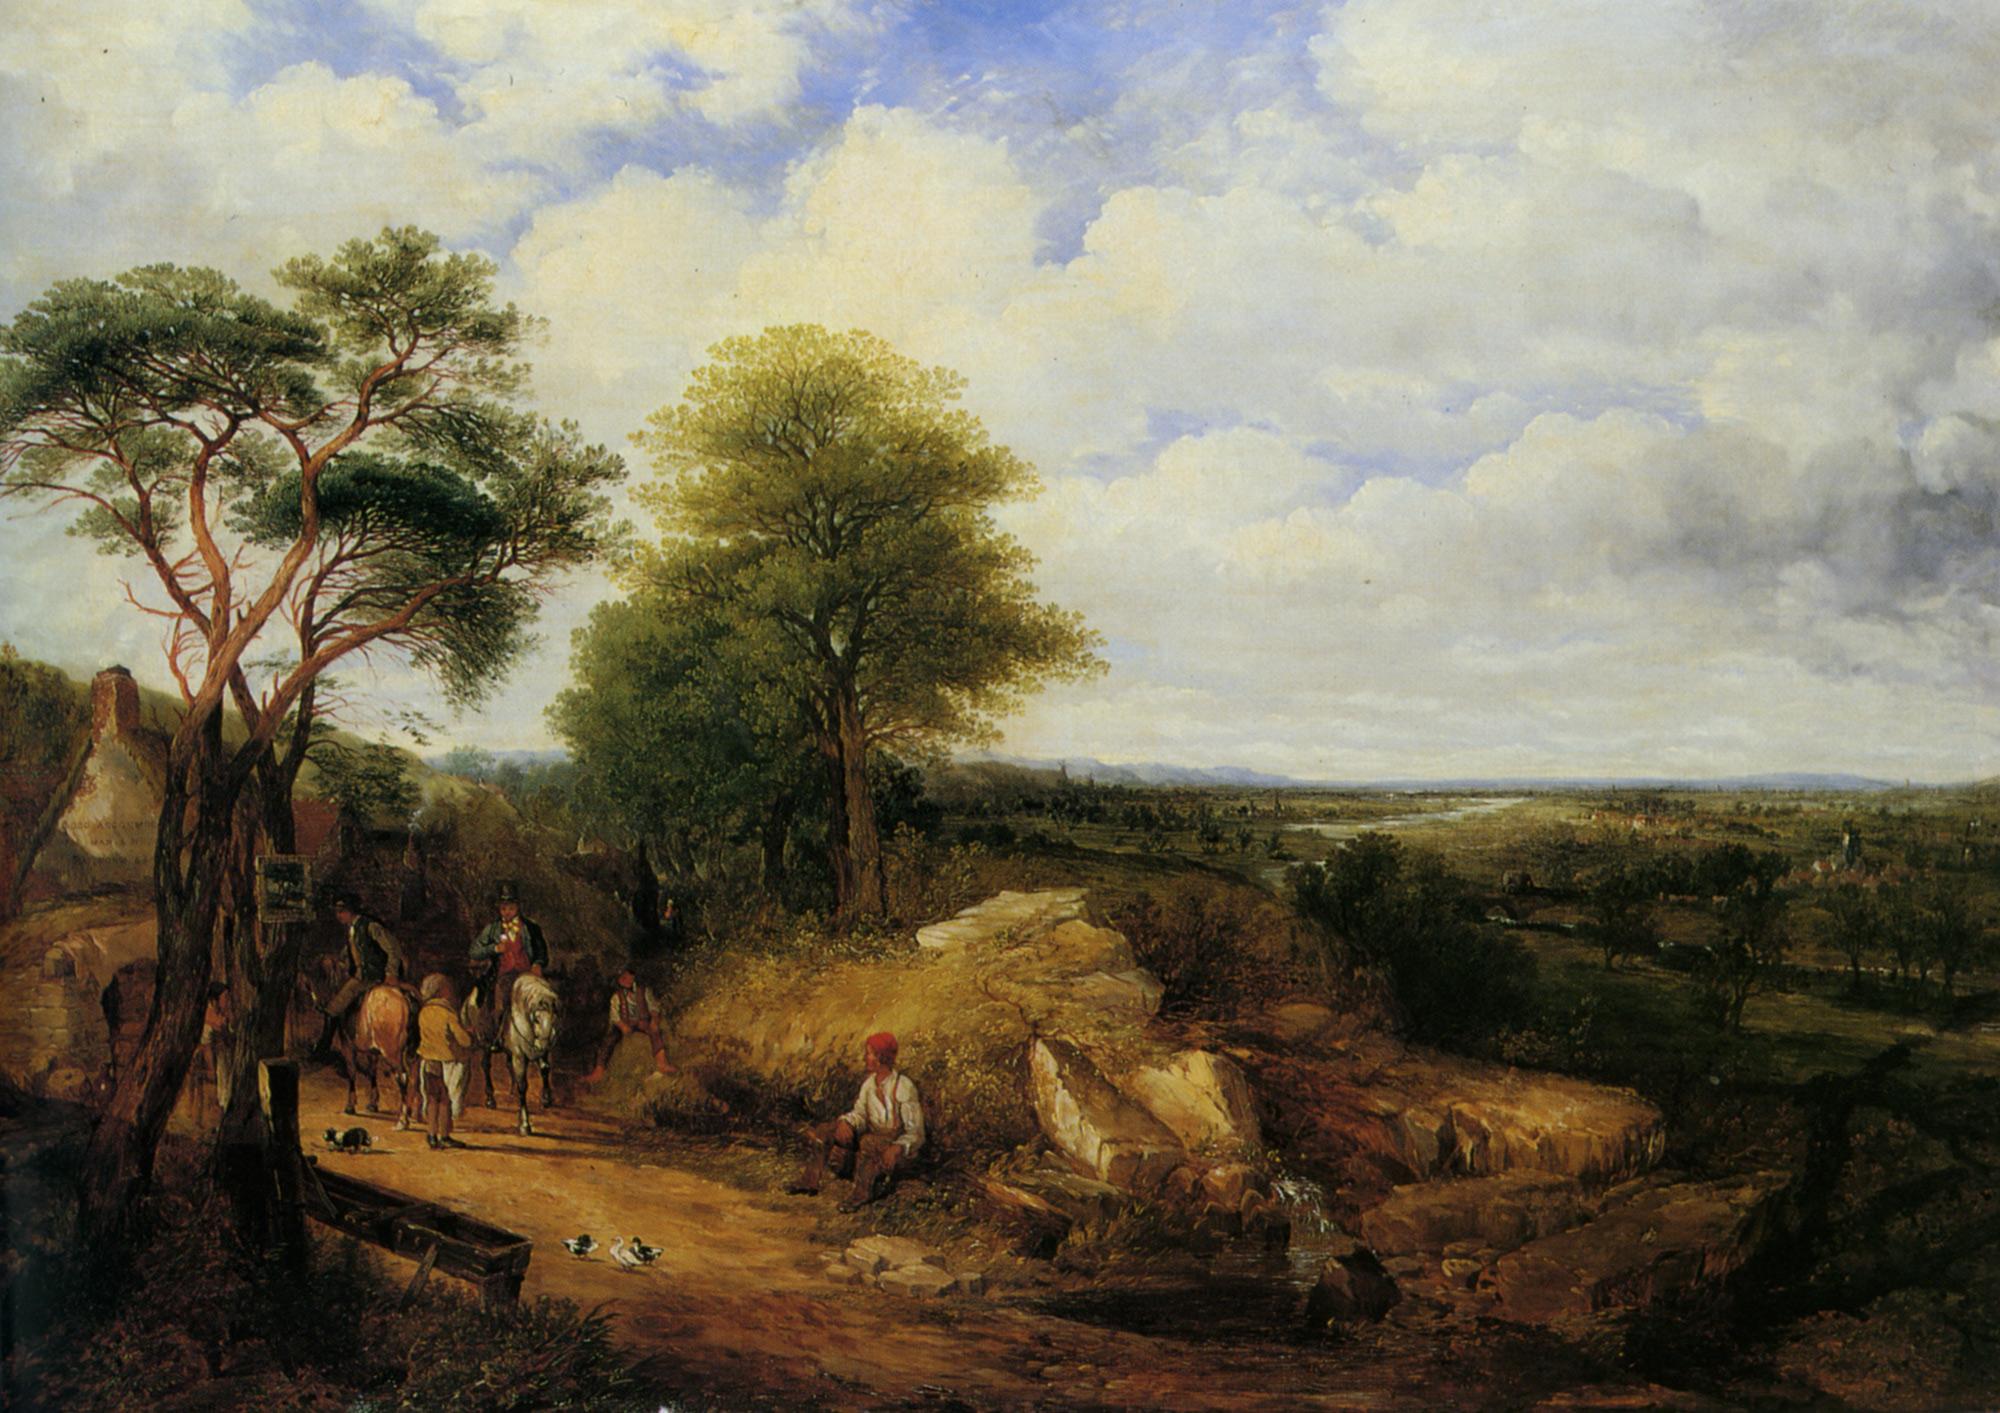 At The Old Fir Tavern on the Derwent Derbyshire :: James Holland - Village life ôîòî